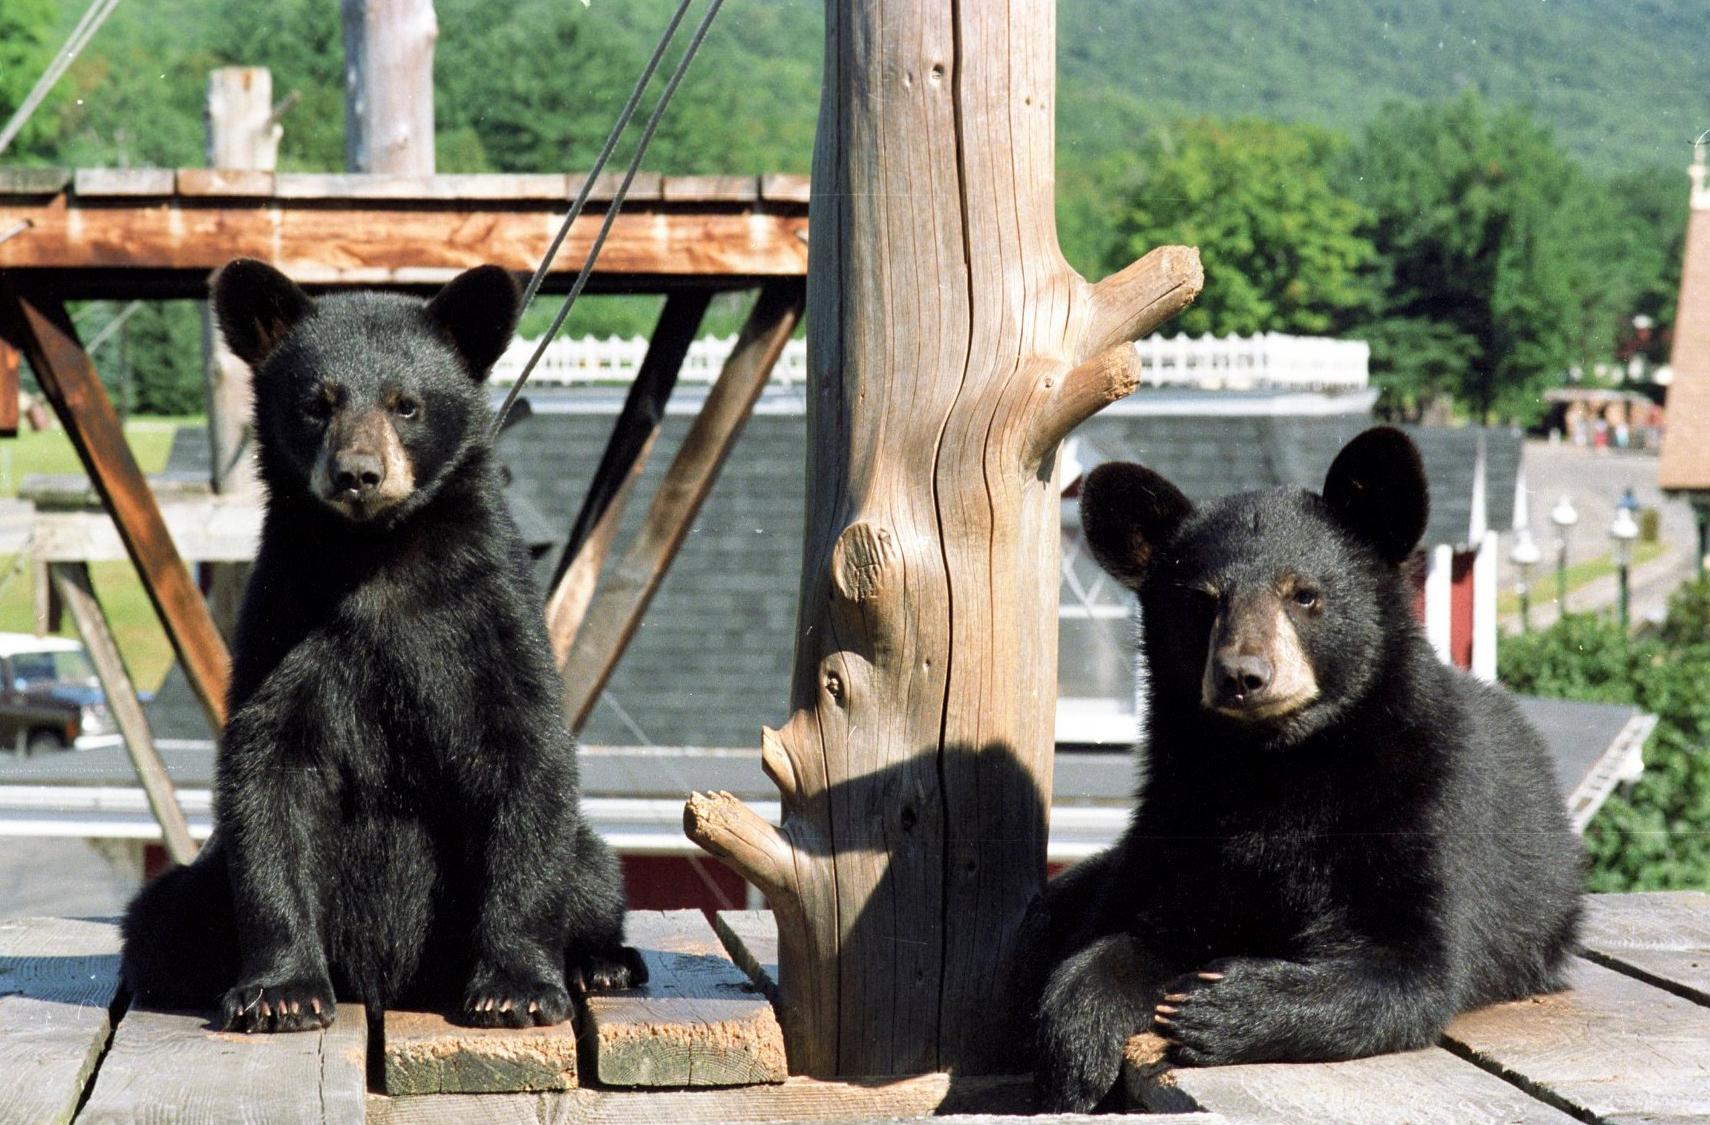 clark trained bears